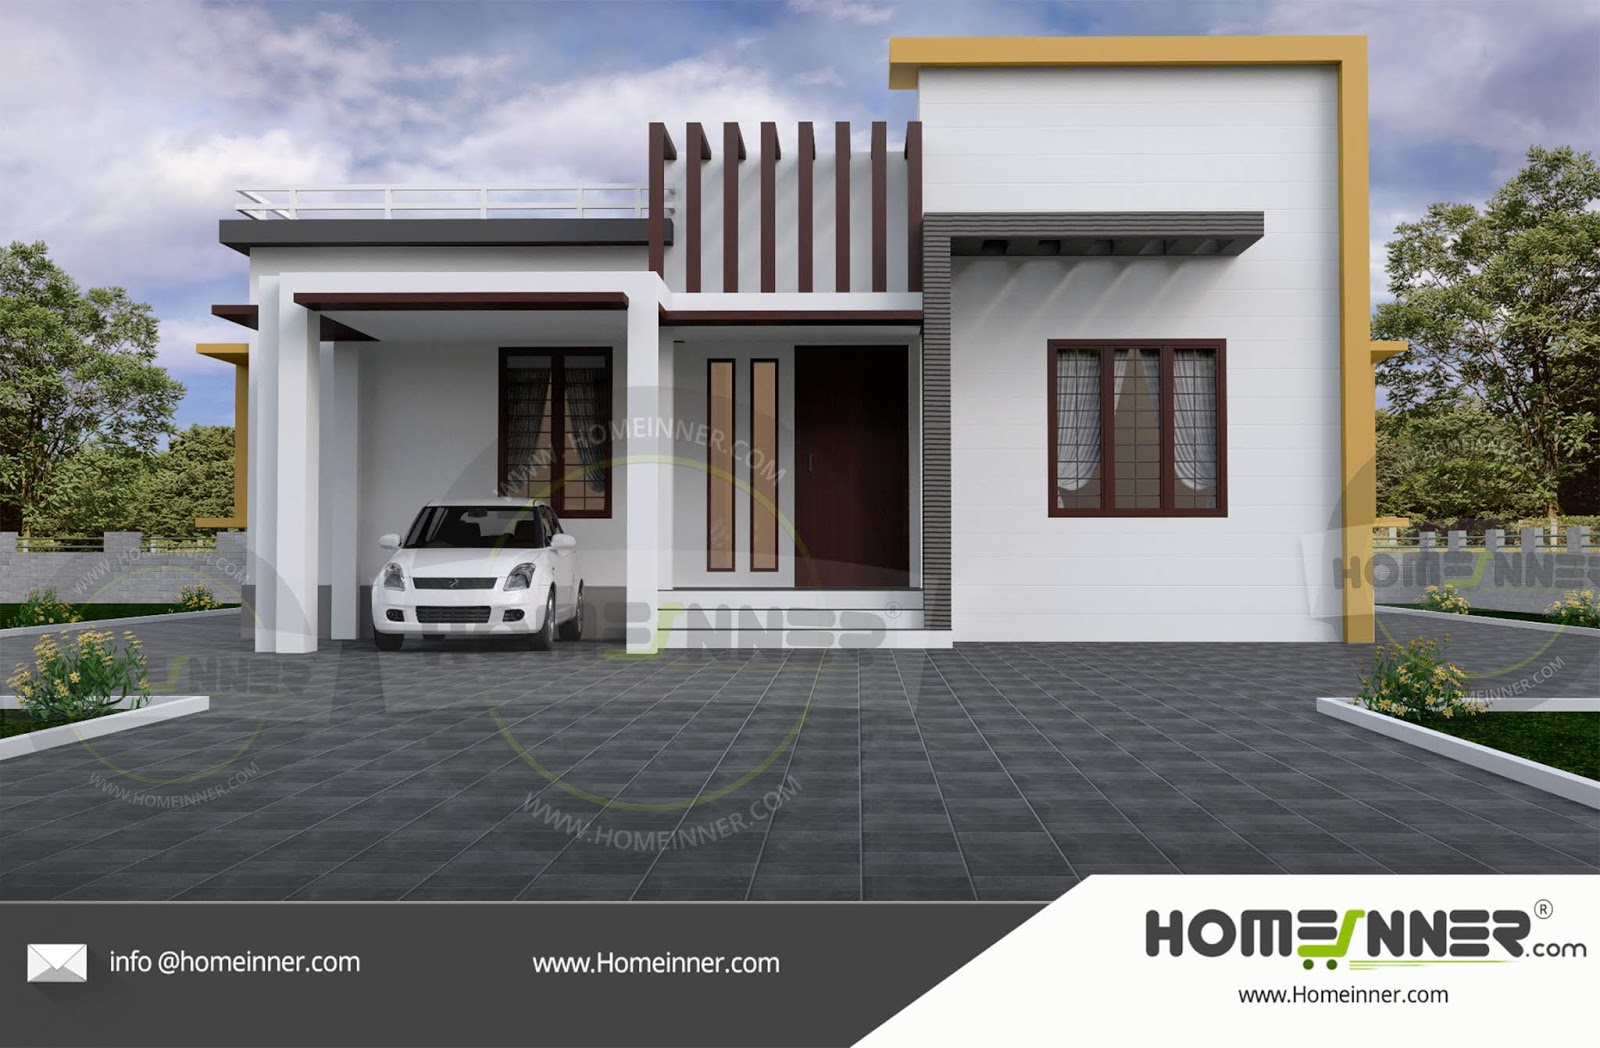 14 Lakh 3 BHK 1000 sq ft Ramagundam Villa